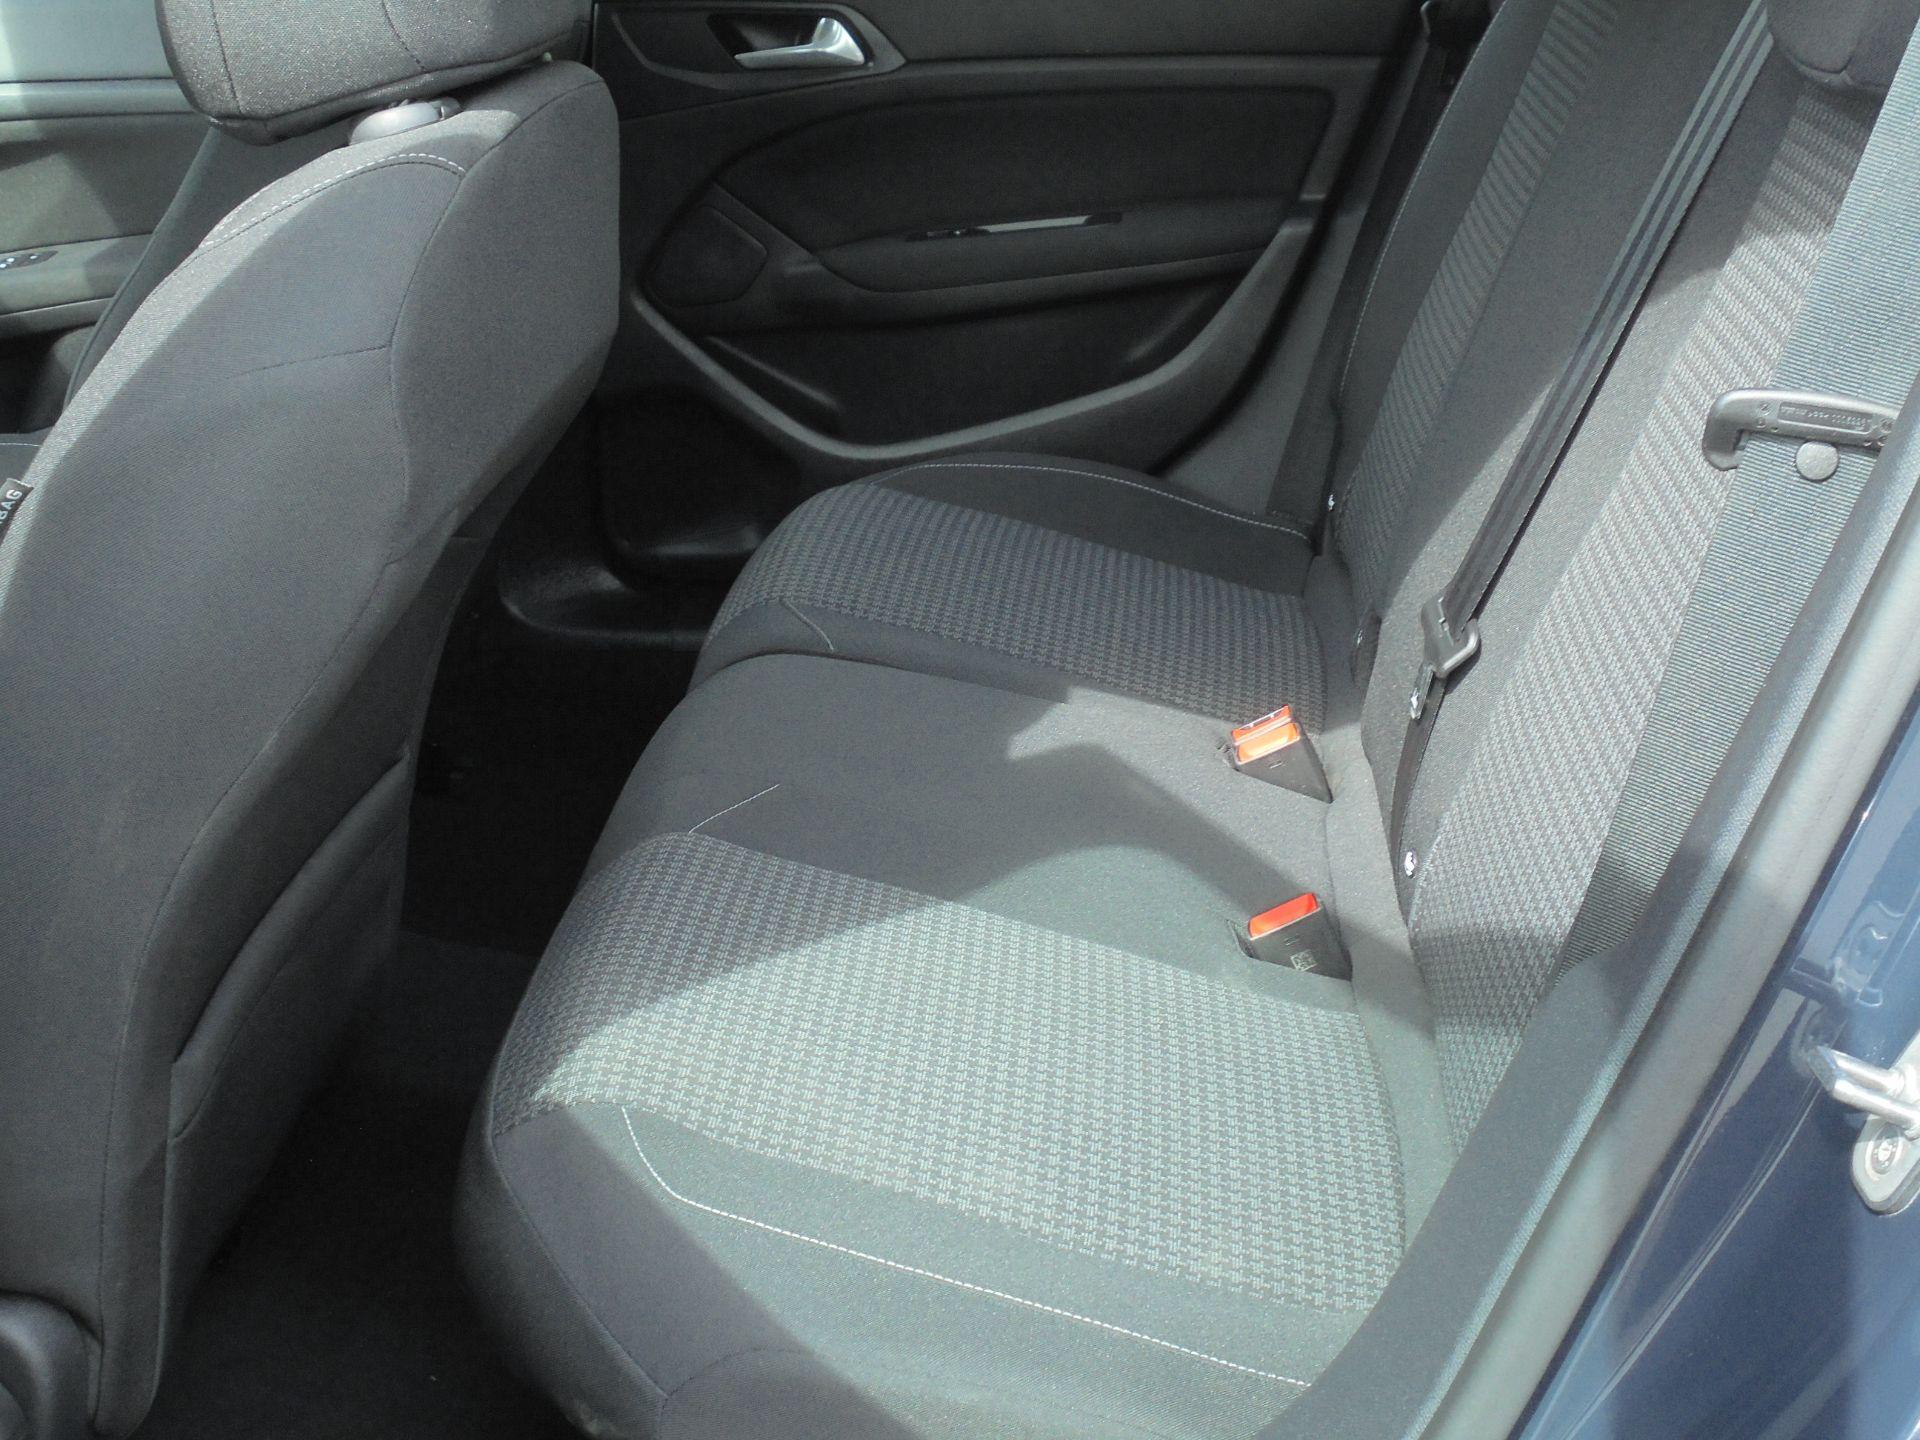 2018 Peugeot 308 1.5 Bluehdi 130 Active 5Dr (NV18FKY) Image 6